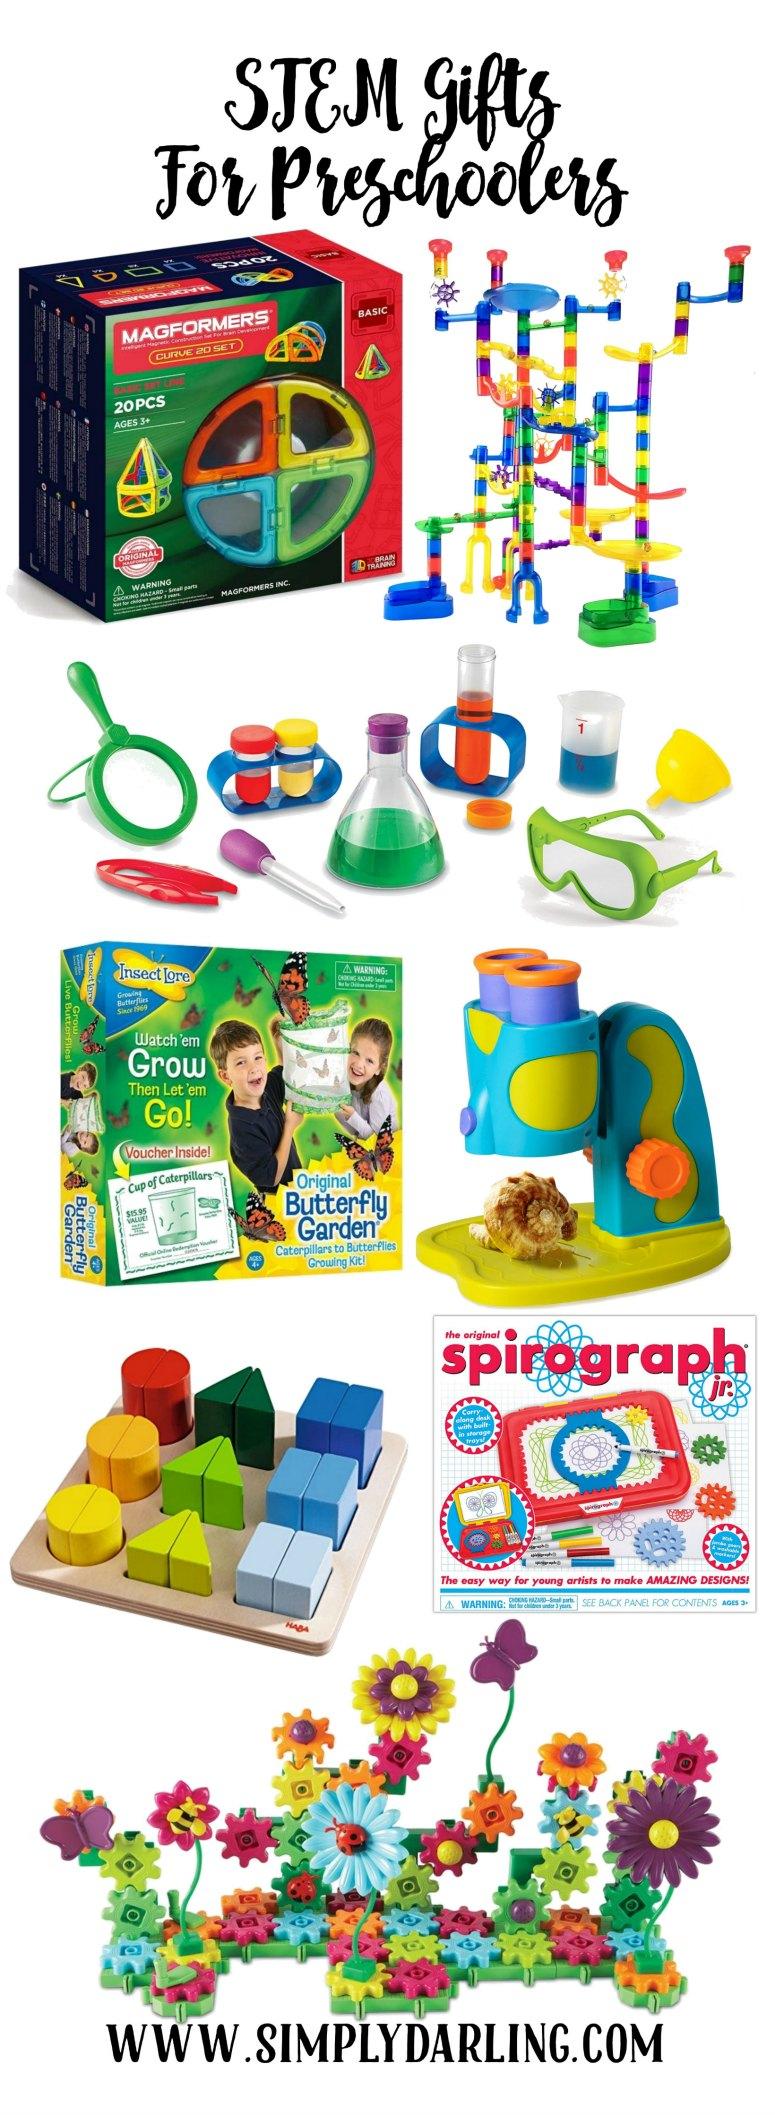 STEM Gifts for Preschoolers